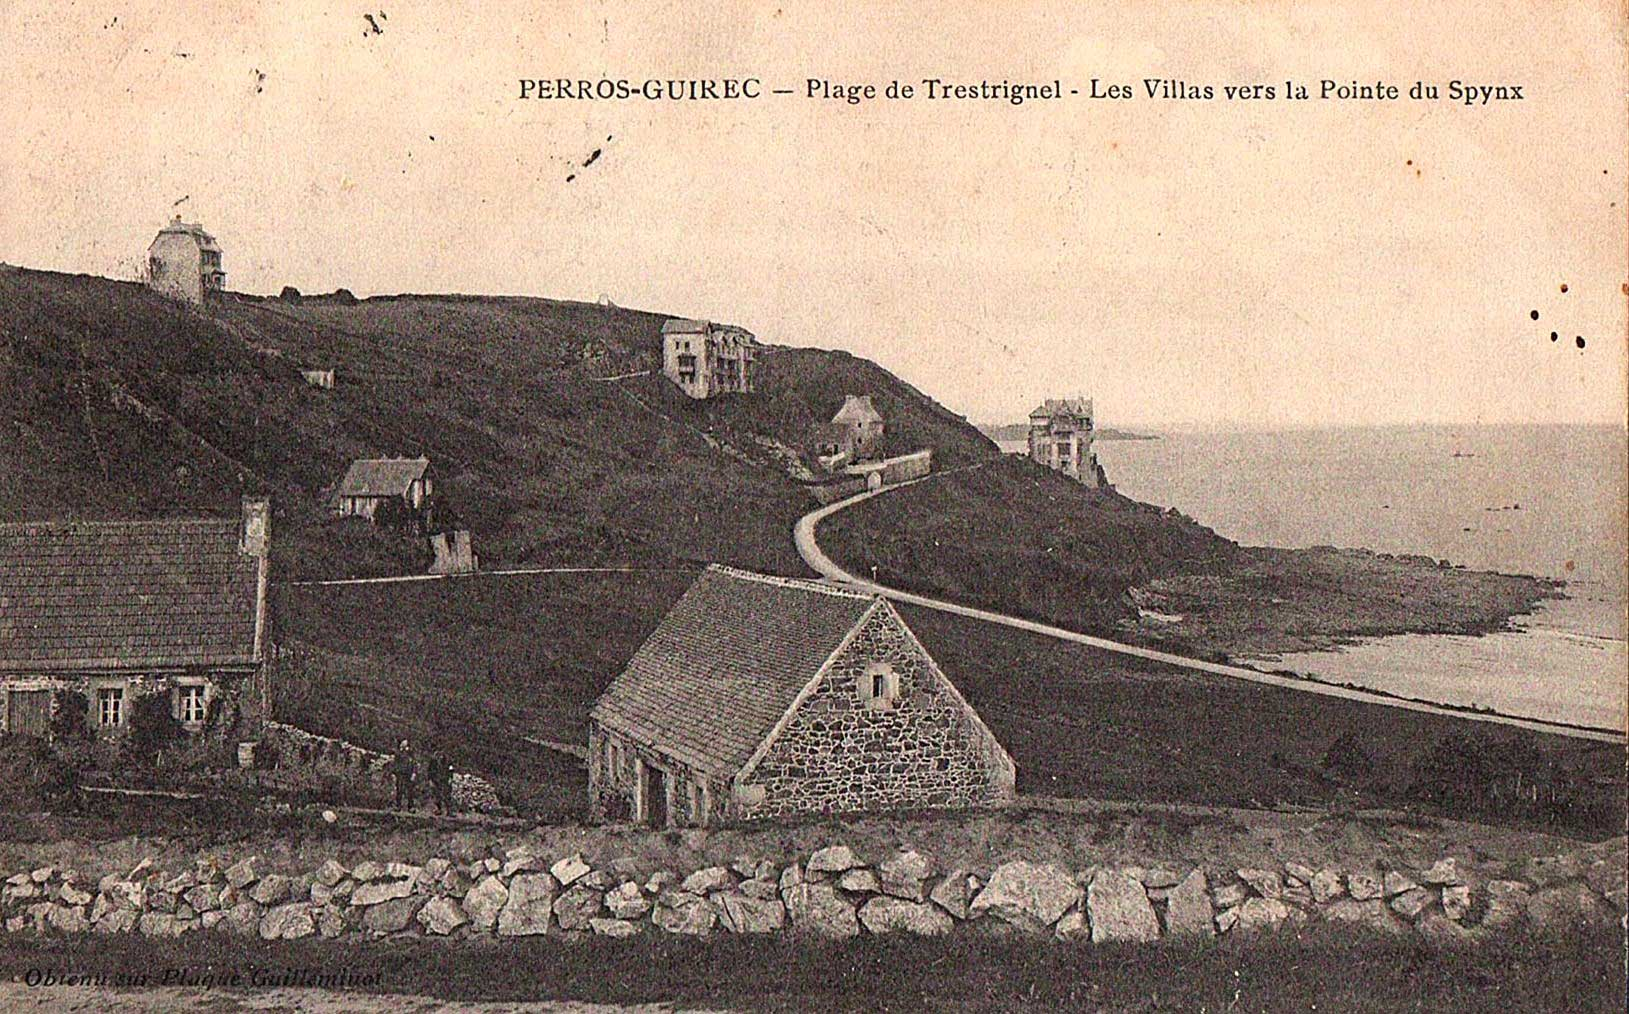 Plage de Trestignel - Perros-Guirec